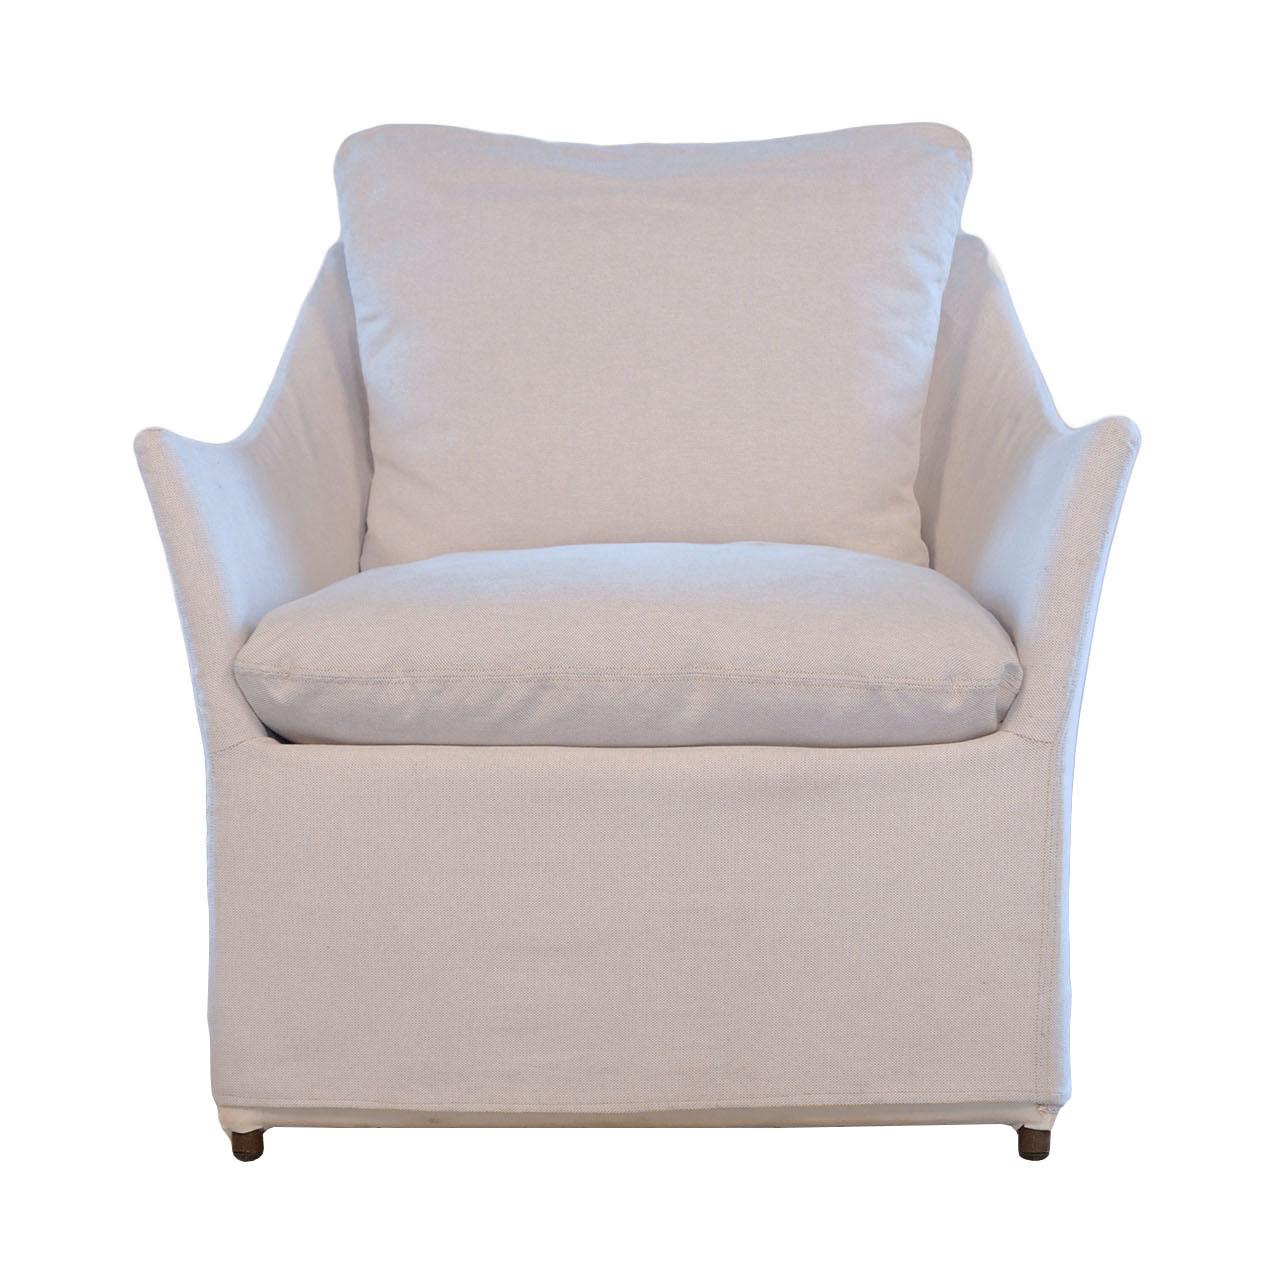 Lloyd Flanders Sea Island Lounge Chair and Ottoman Set